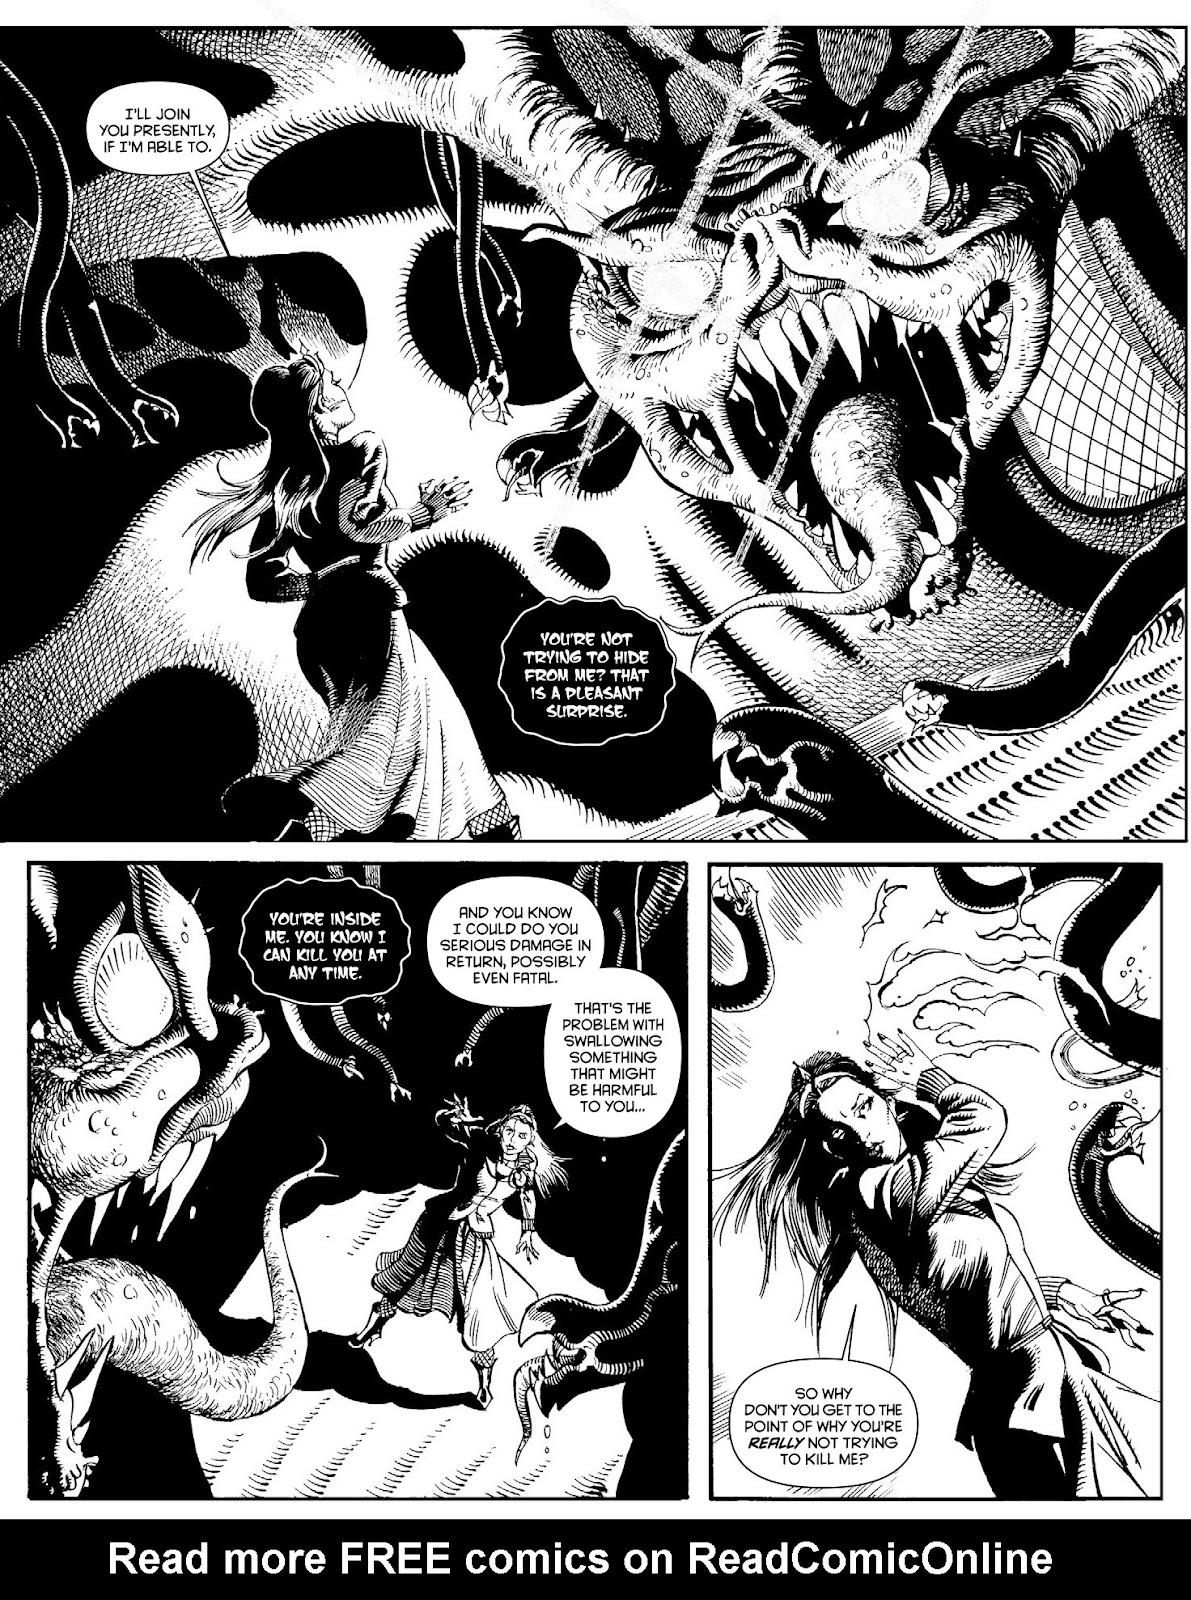 Judge Dredd Megazine (Vol. 5) issue 427 - Page 105